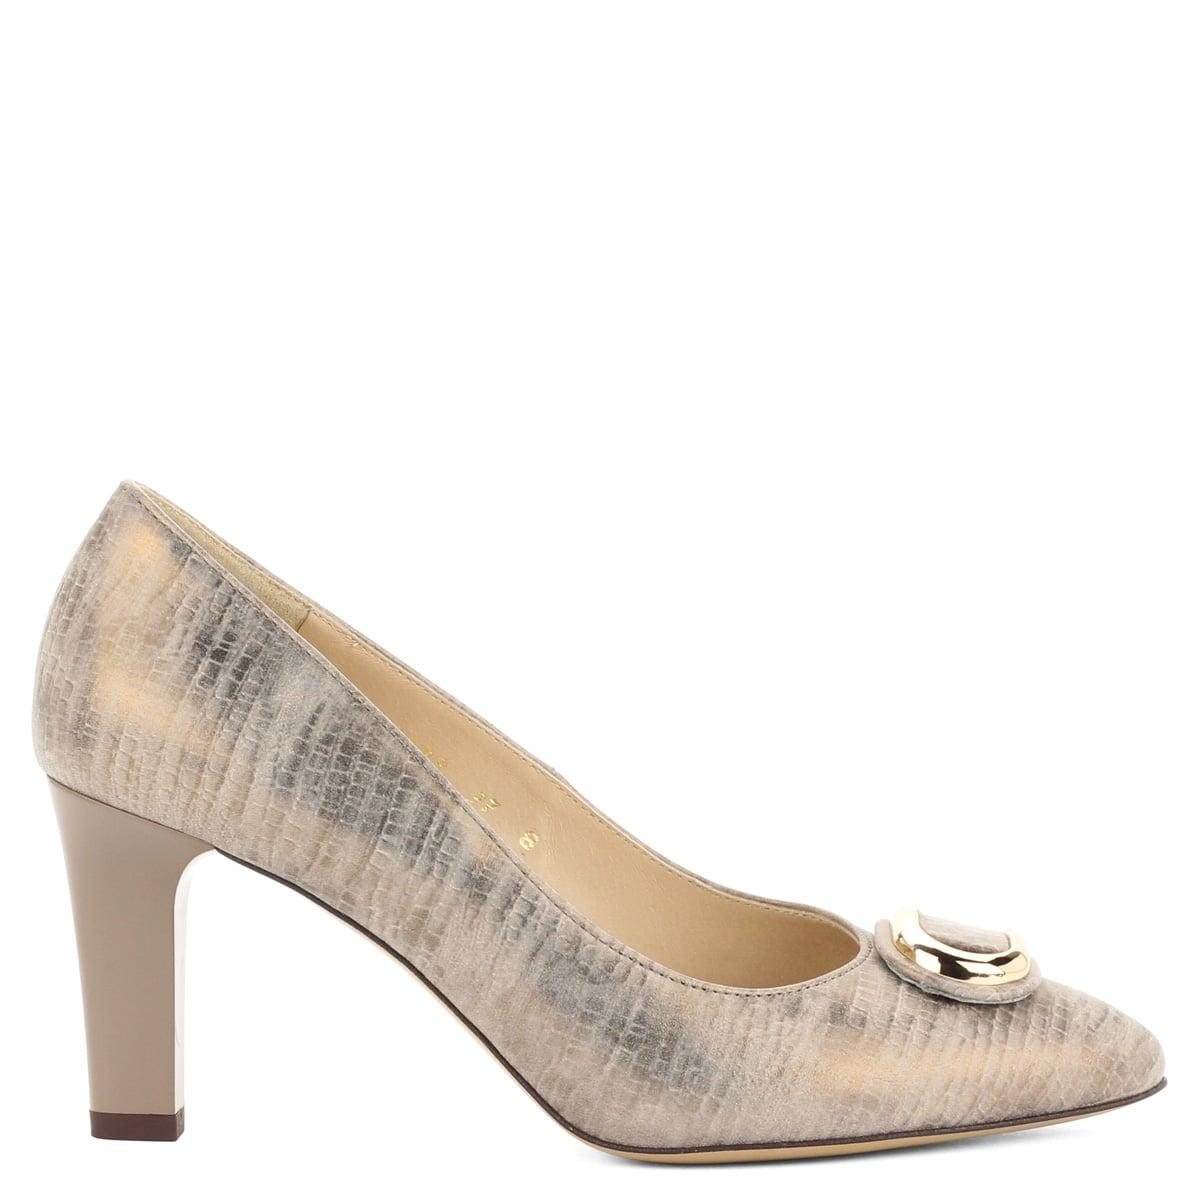 Anis arany színű magas sarkú cipő 9e00701c3a